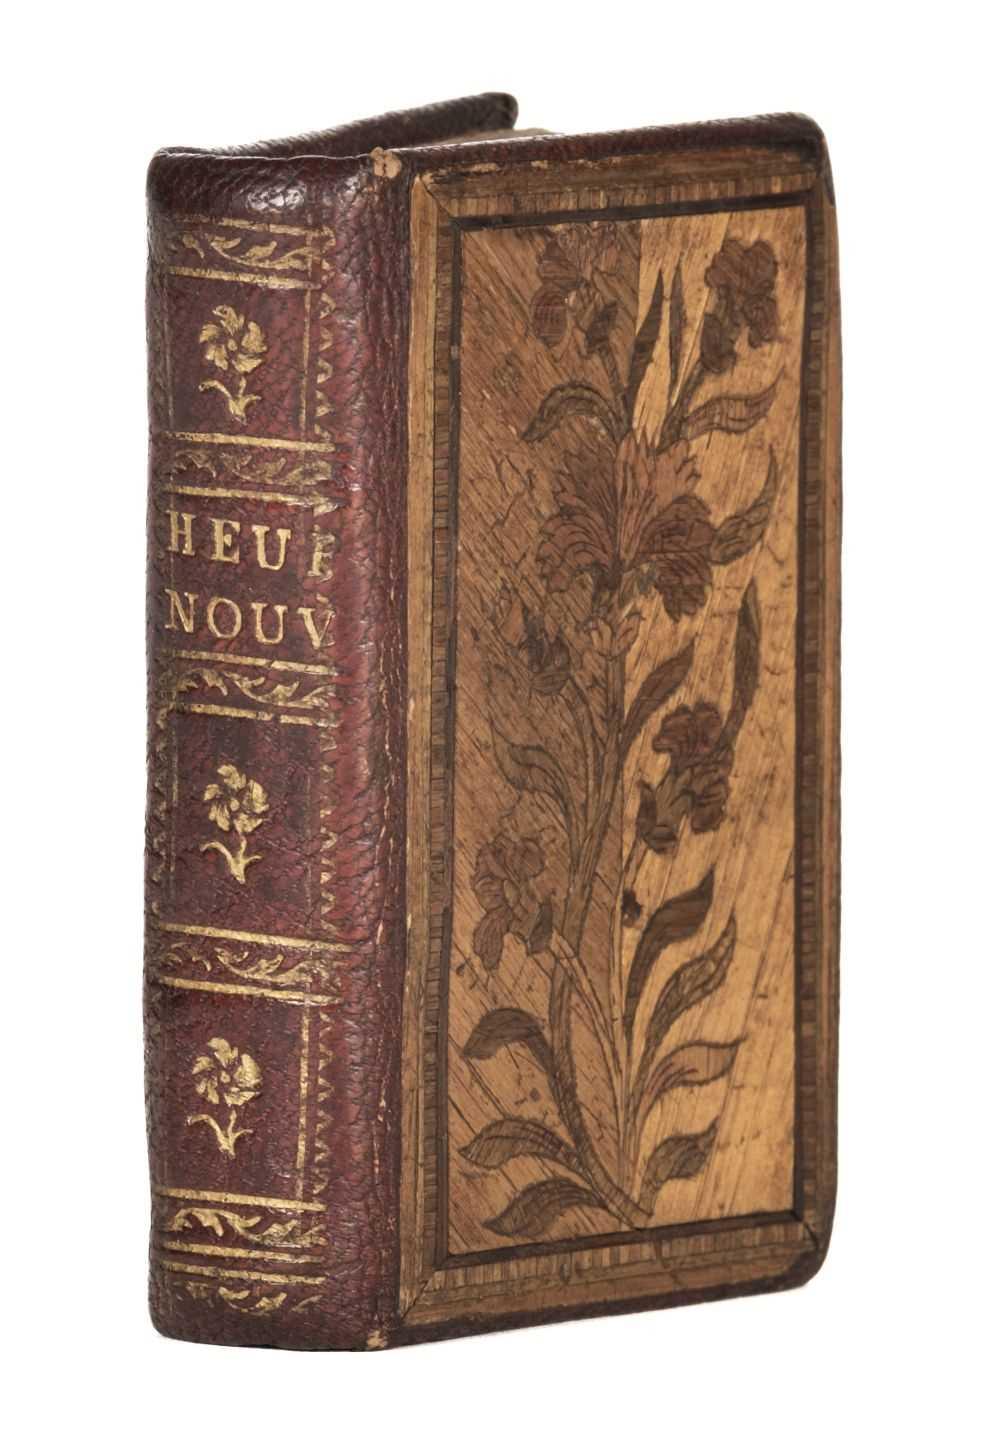 Lot 462 - Straw-work miniature binding. Heures Nouvelles, Dediees A La Noblesse, 1787